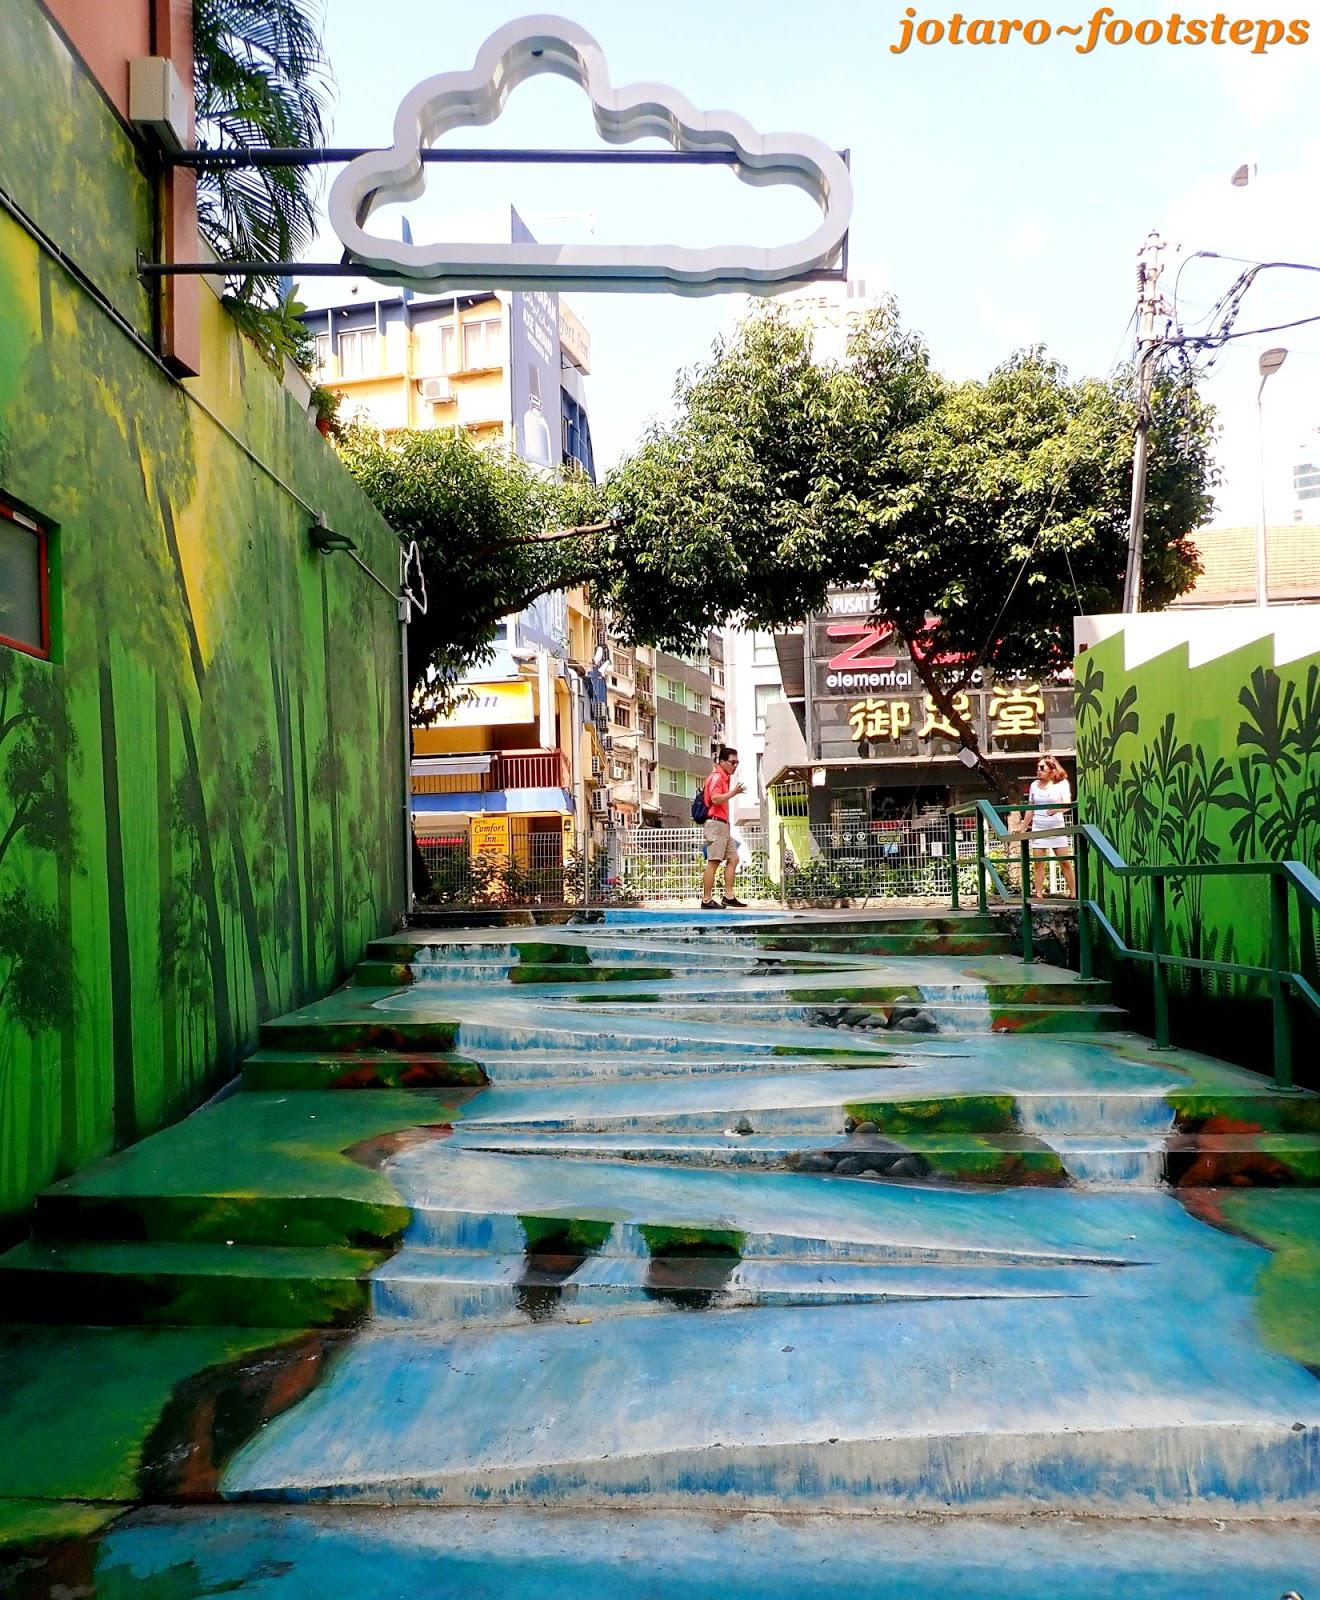 Footsteps Jotaro S Travels Art Gallery Jalan Alor Street Art